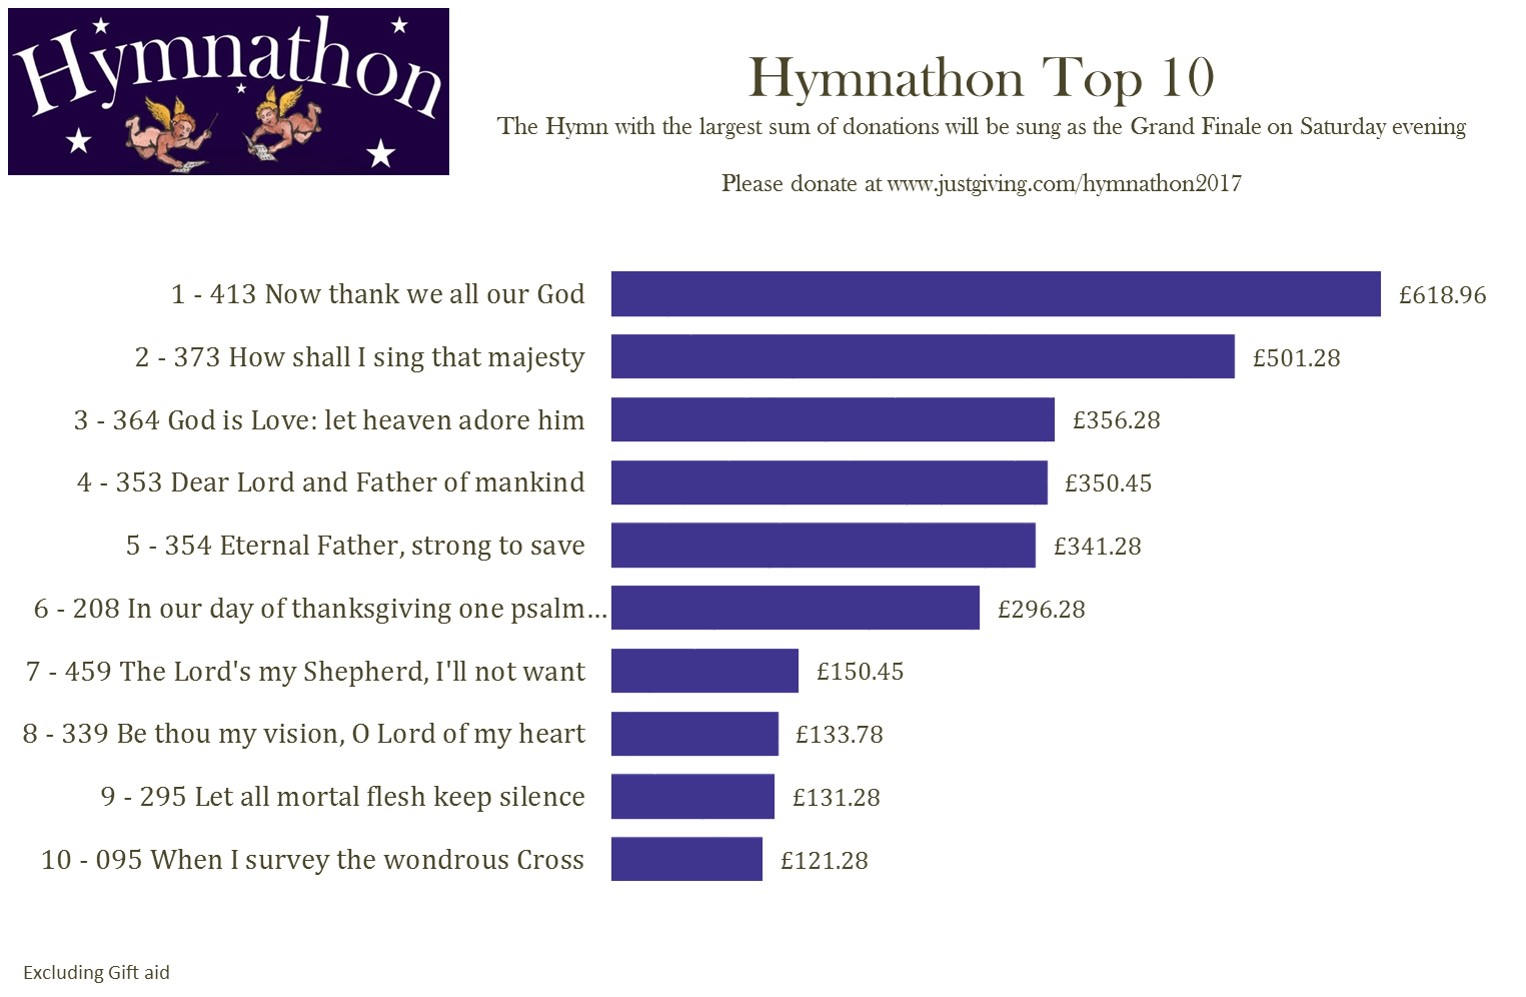 Top 10 Thu 2nd Mar